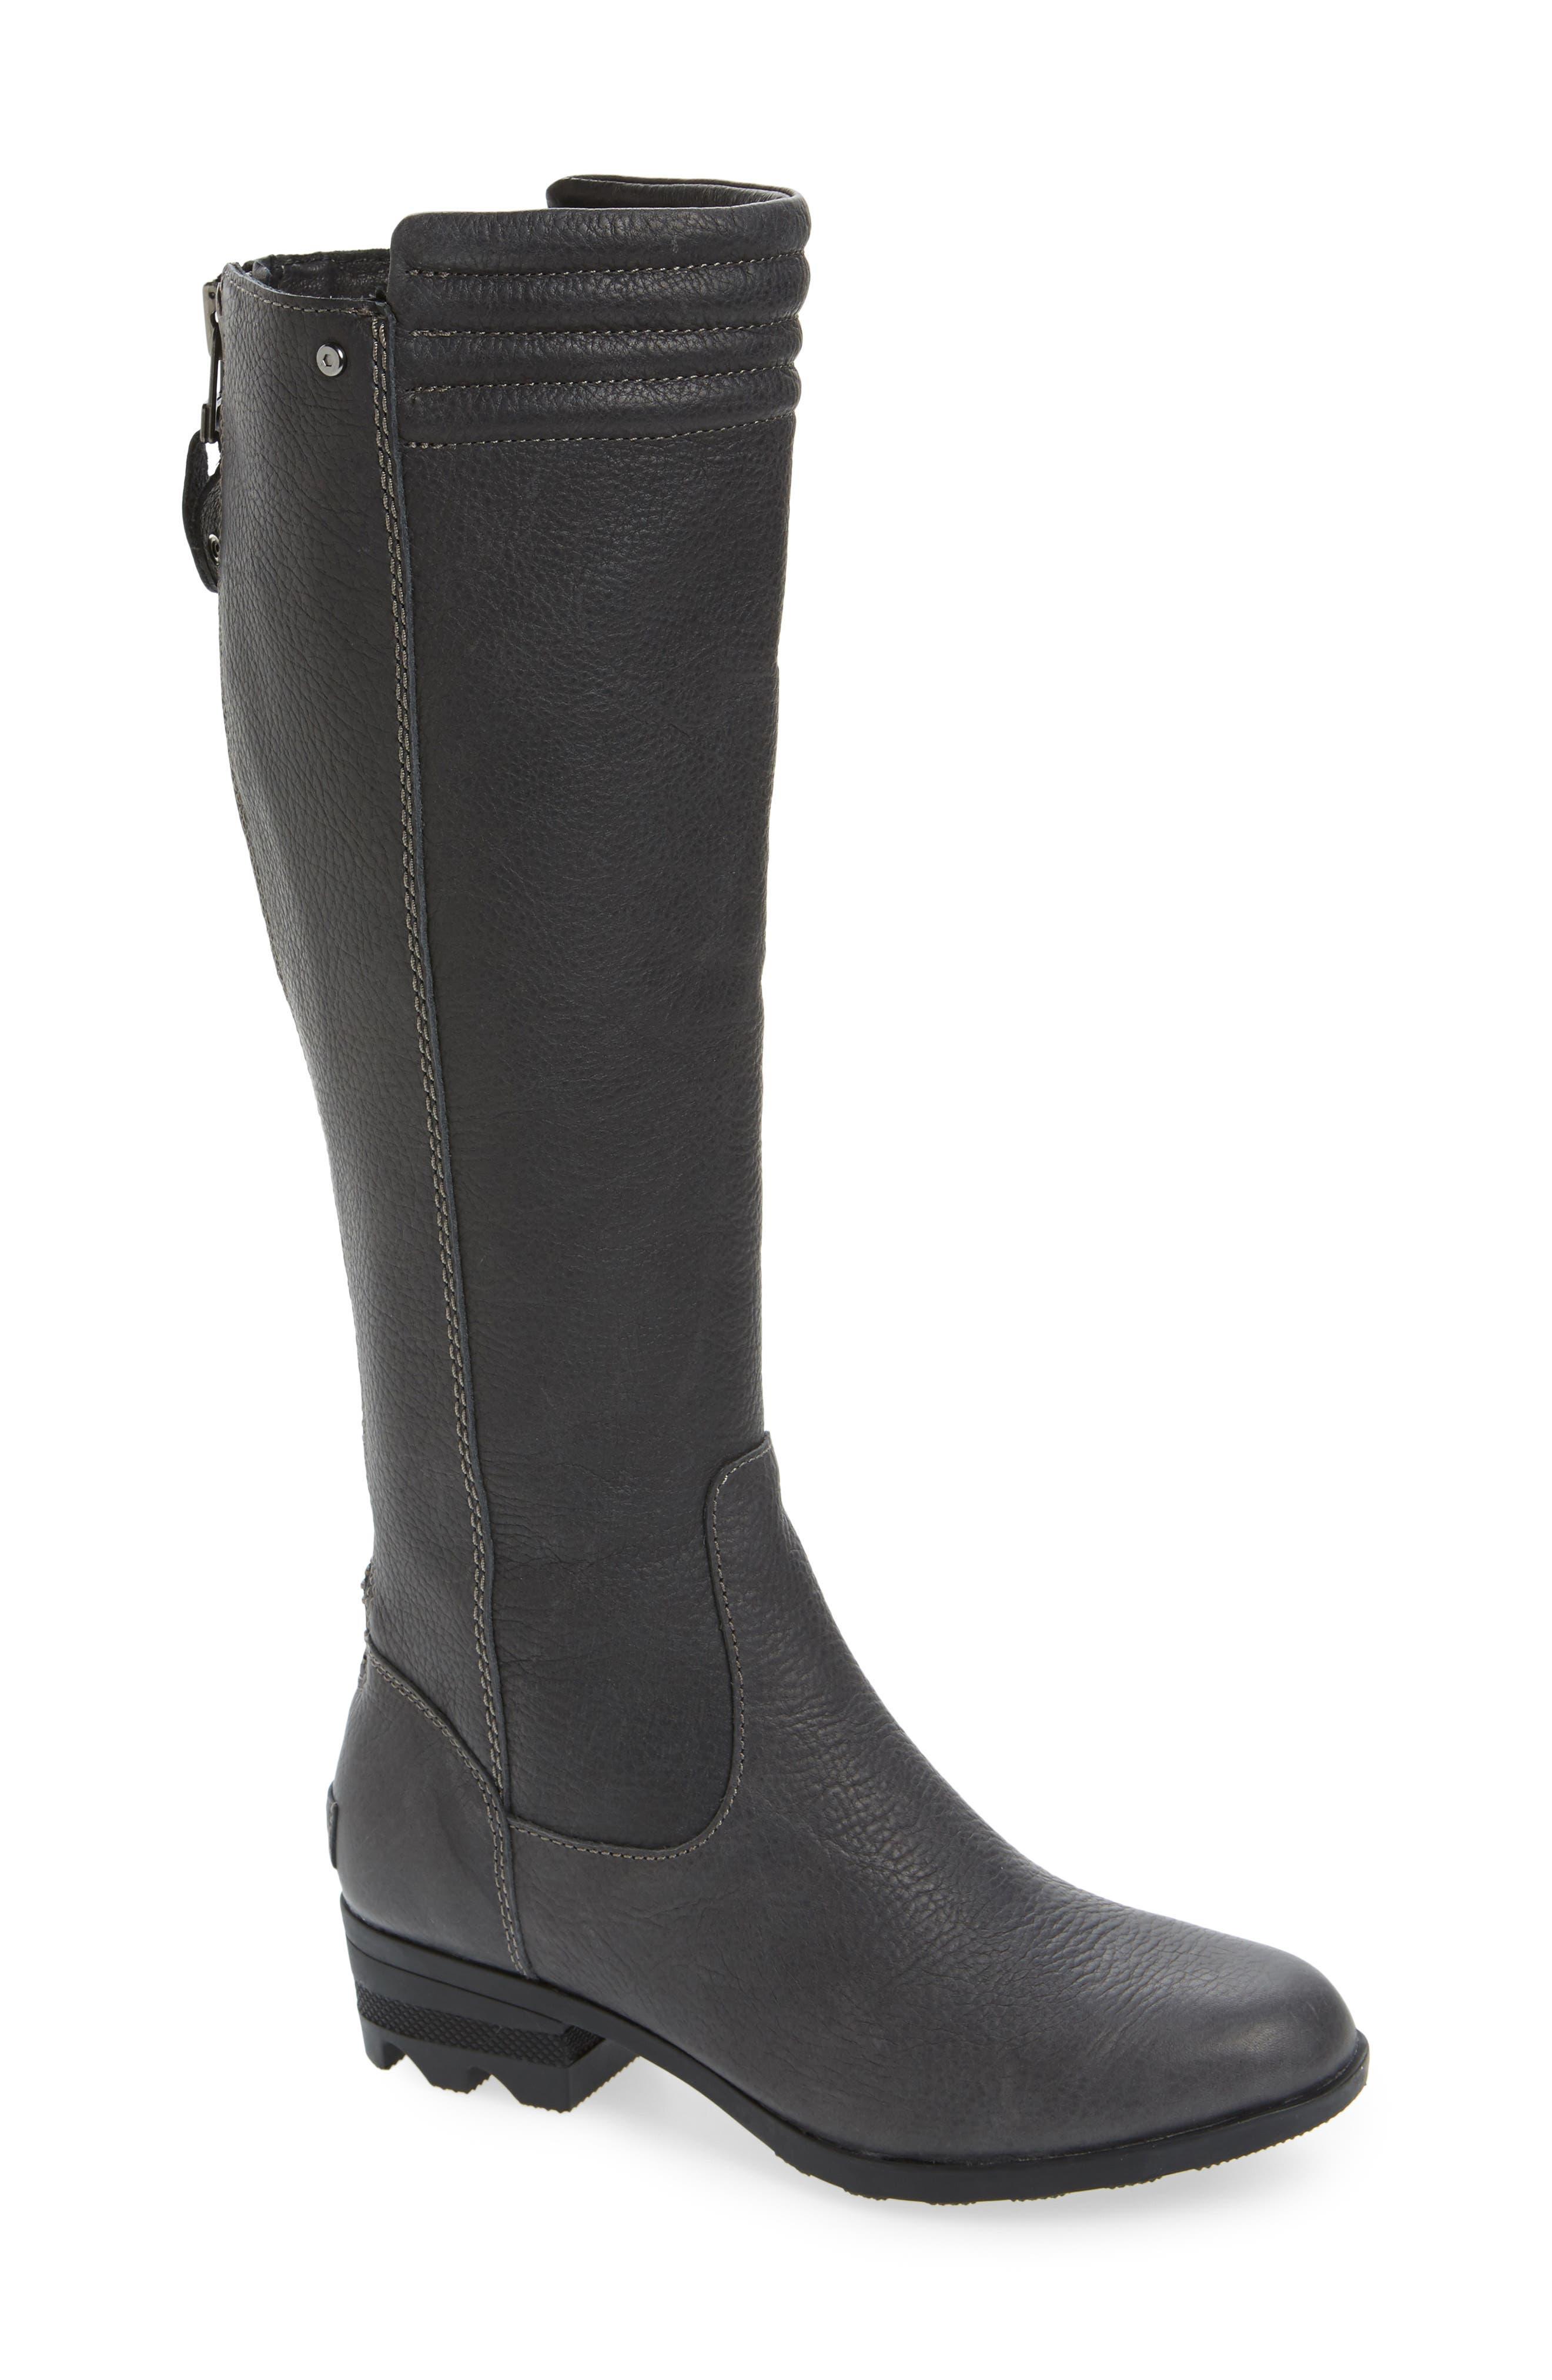 Danica Waterproof Knee High Boot,                         Main,                         color, Quarry/ Black